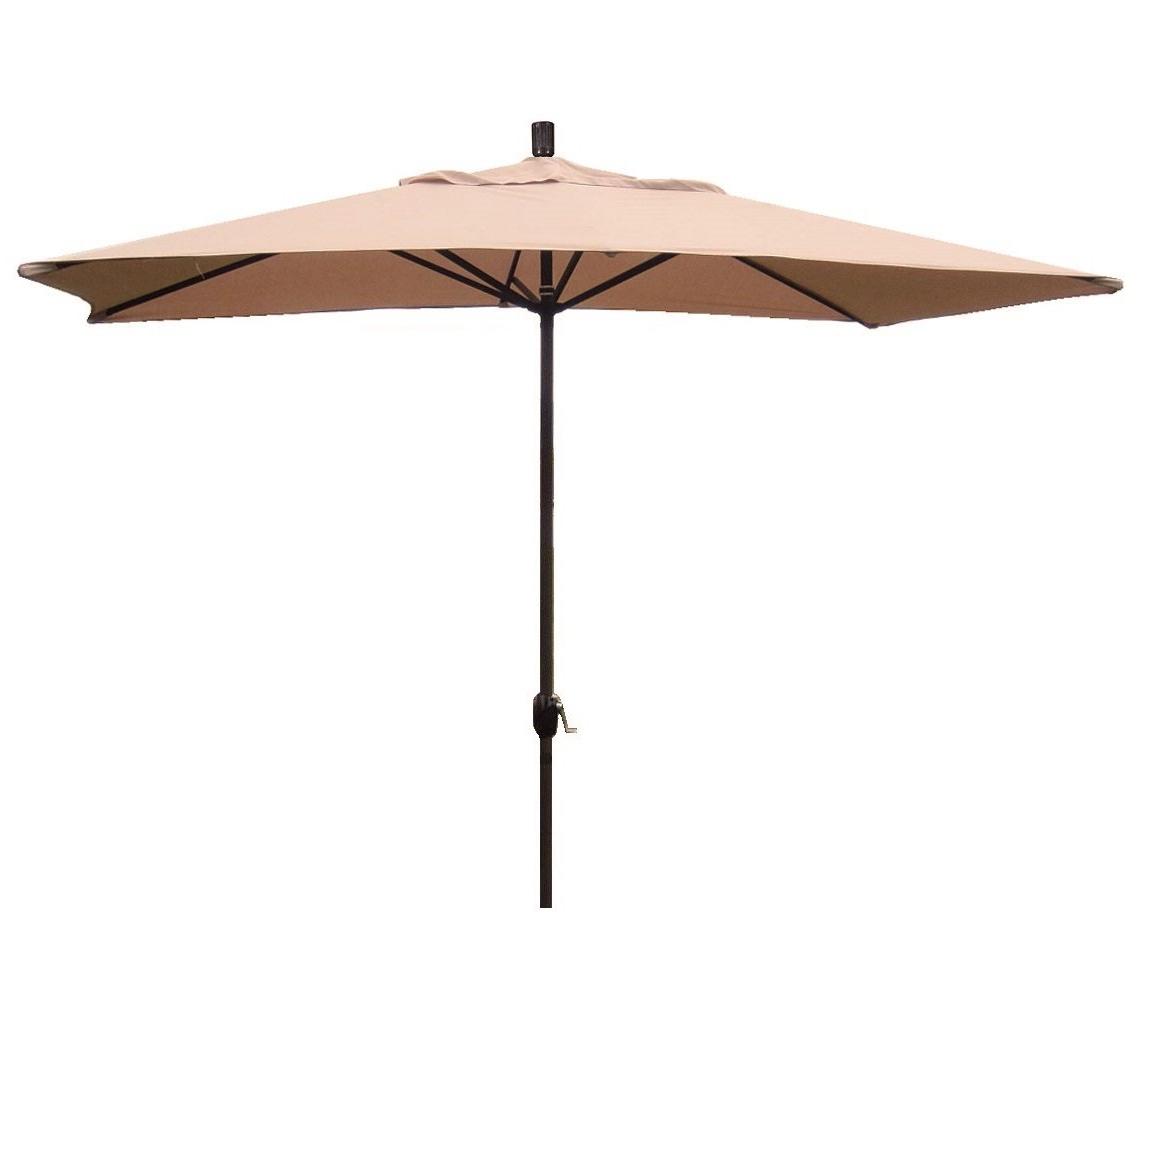 Dena Rectangular Market Umbrellas Intended For 2019 Grieve 10' X 6' Rectangular Market Umbrella (View 6 of 20)